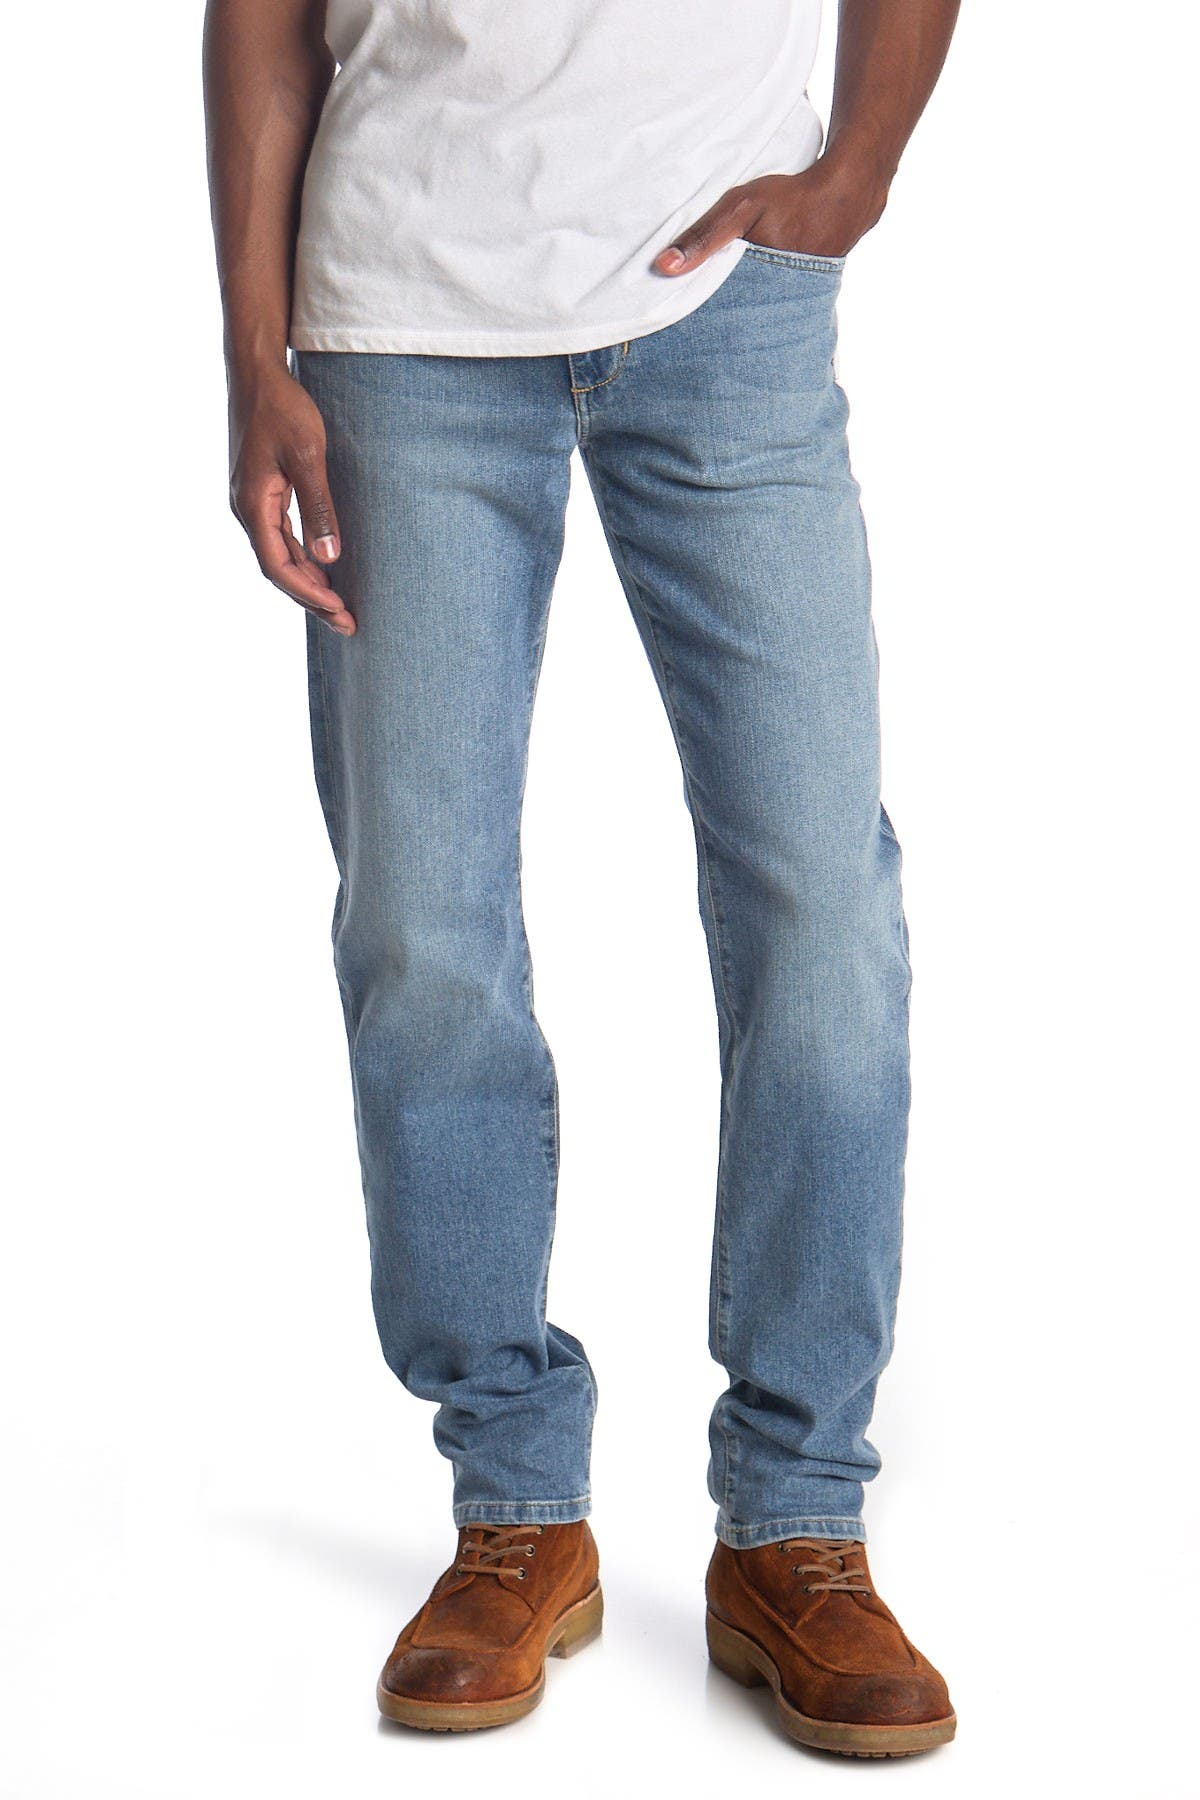 Image of Joe's Jeans Brixton Jeans